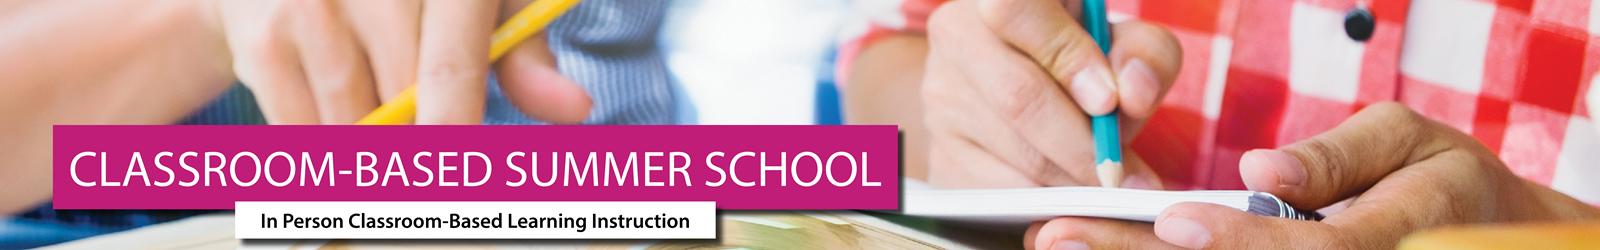 Classroom-Based Summer School Banner.jpg